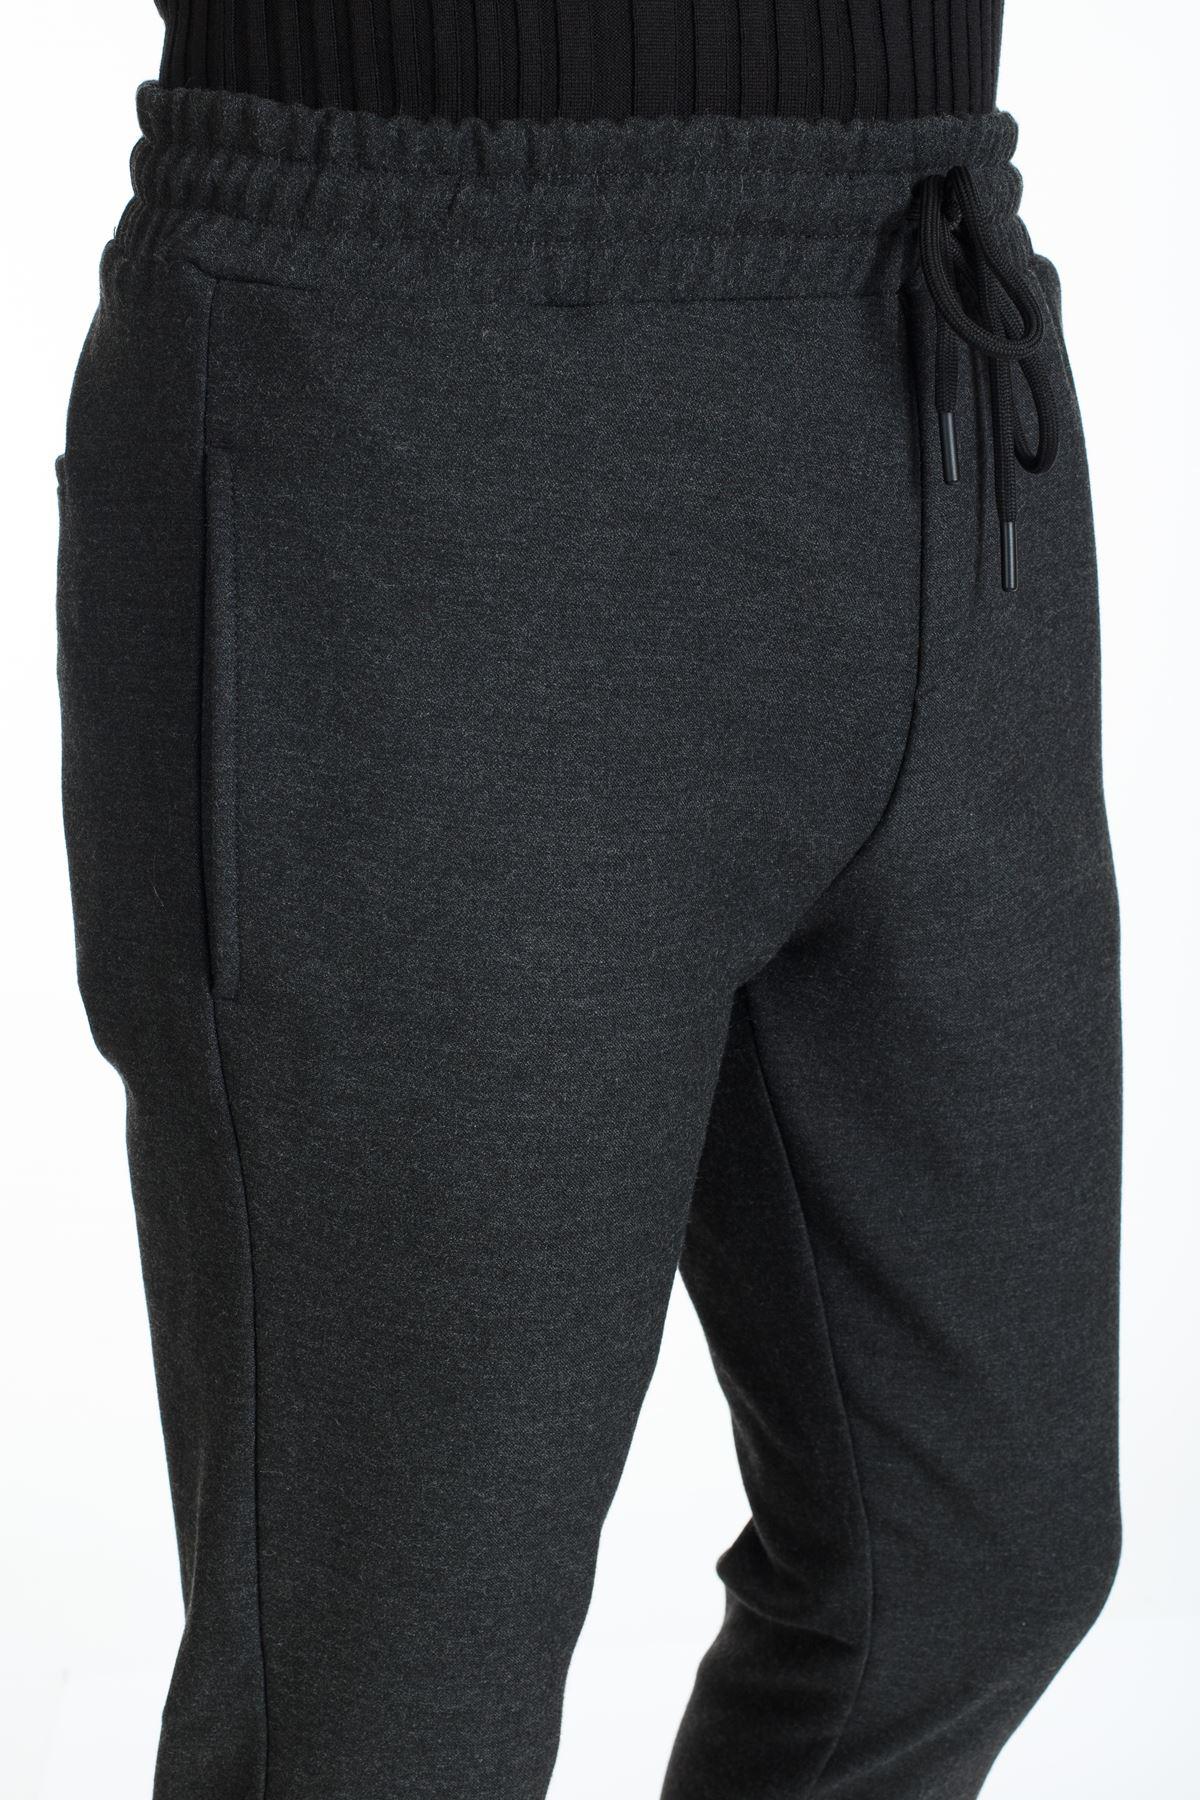 Antrasit İpli Slim Kalıp Paça Lastikli Jogger Pantolon